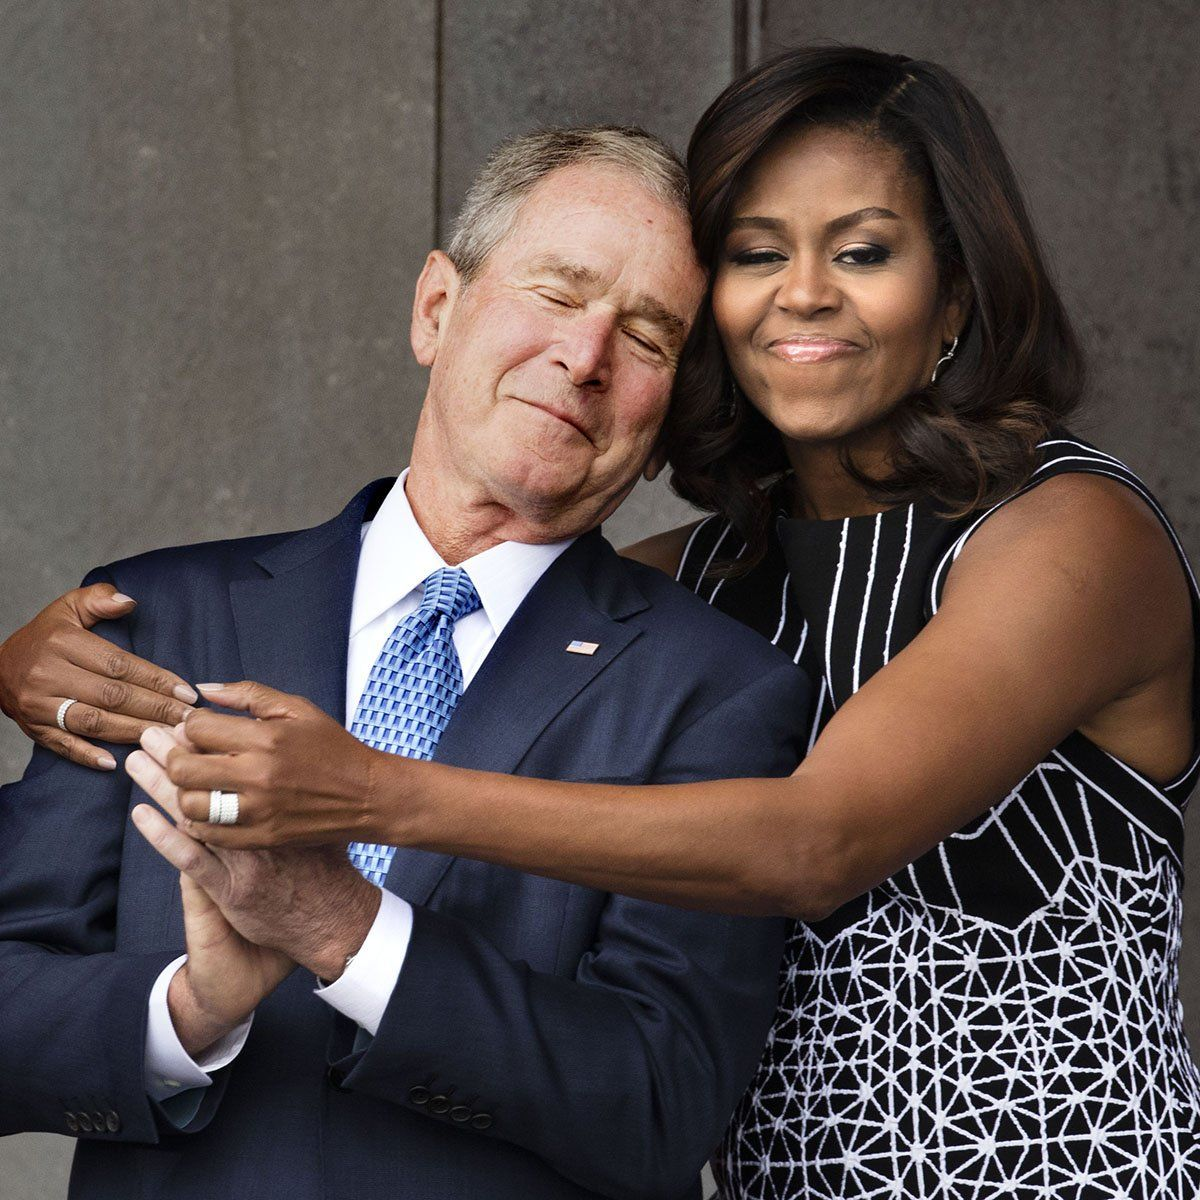 Image result for michelle obama george w. bush